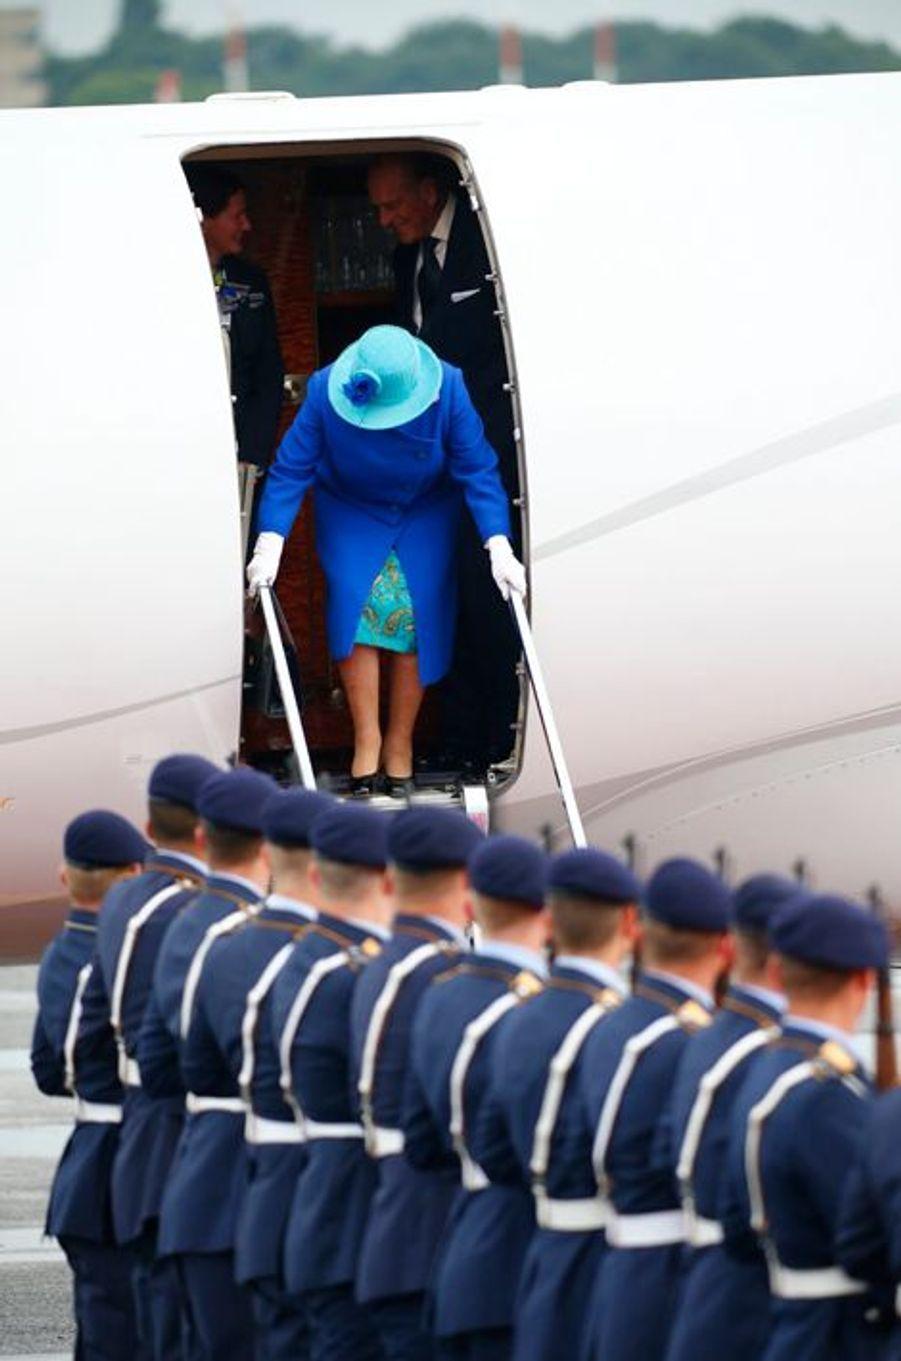 La reine Elizabeth II arrive à Berlin, le 23 juin 2015